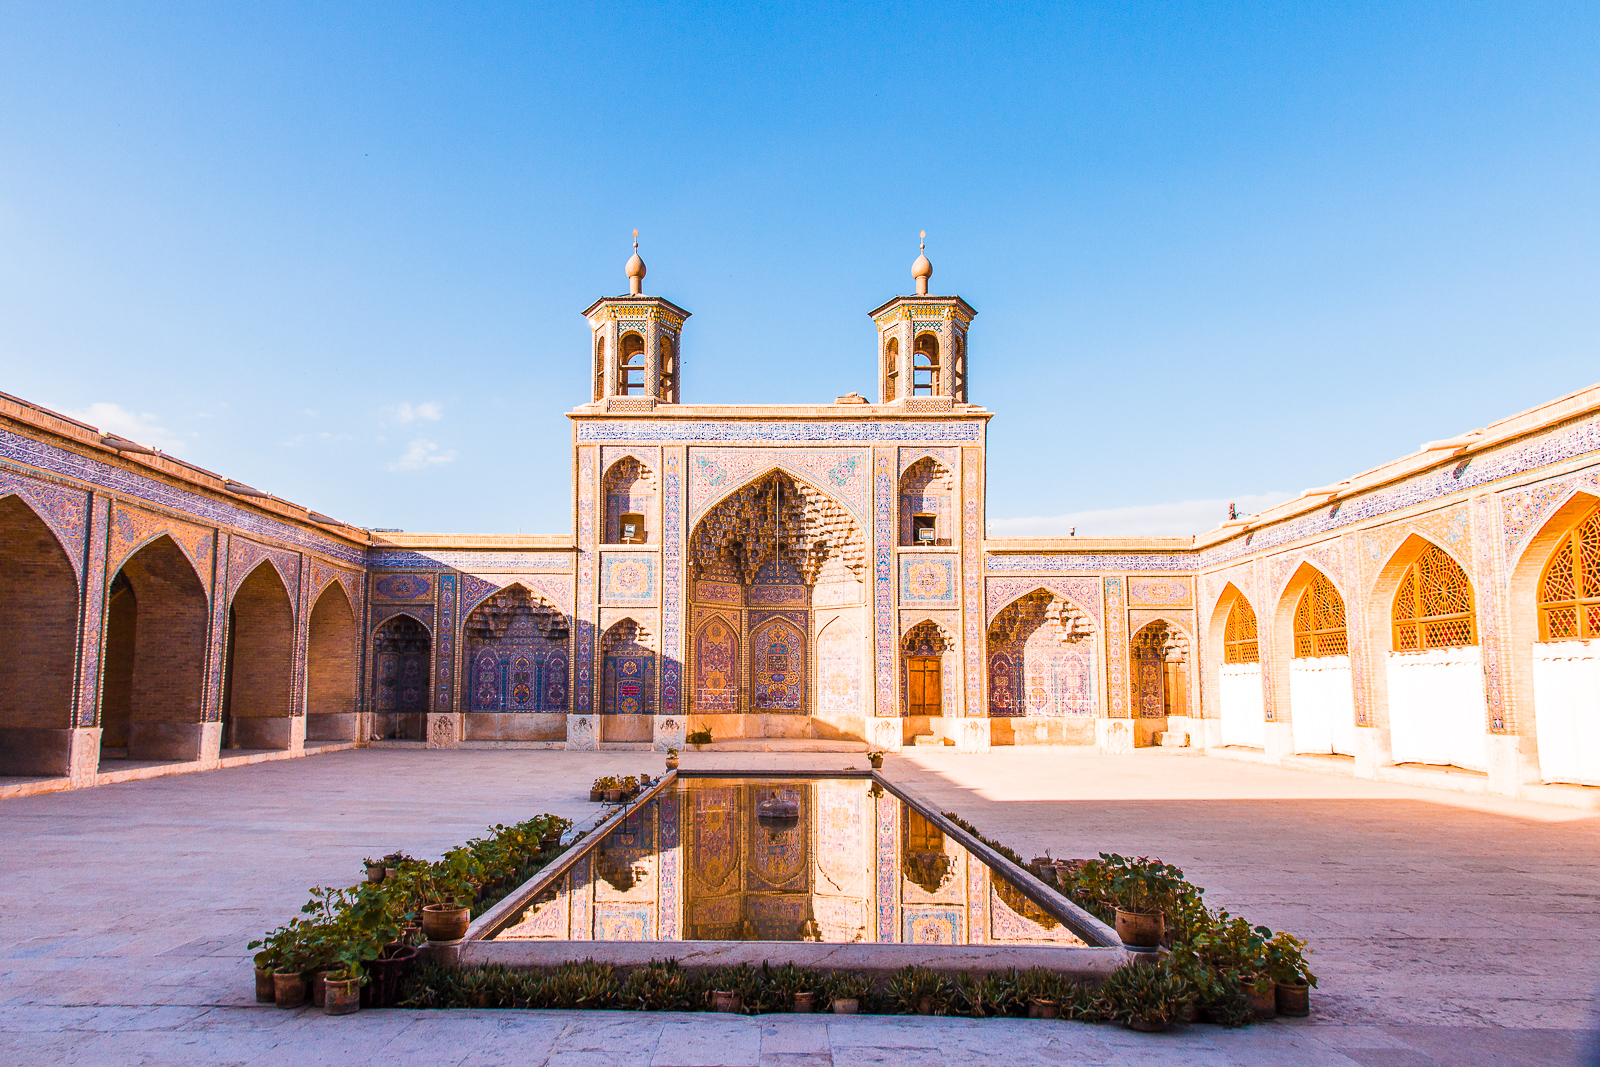 Visit the Nasir Al-Mulk Mosque in Shiraz - Iran's Most Colorful Mosque